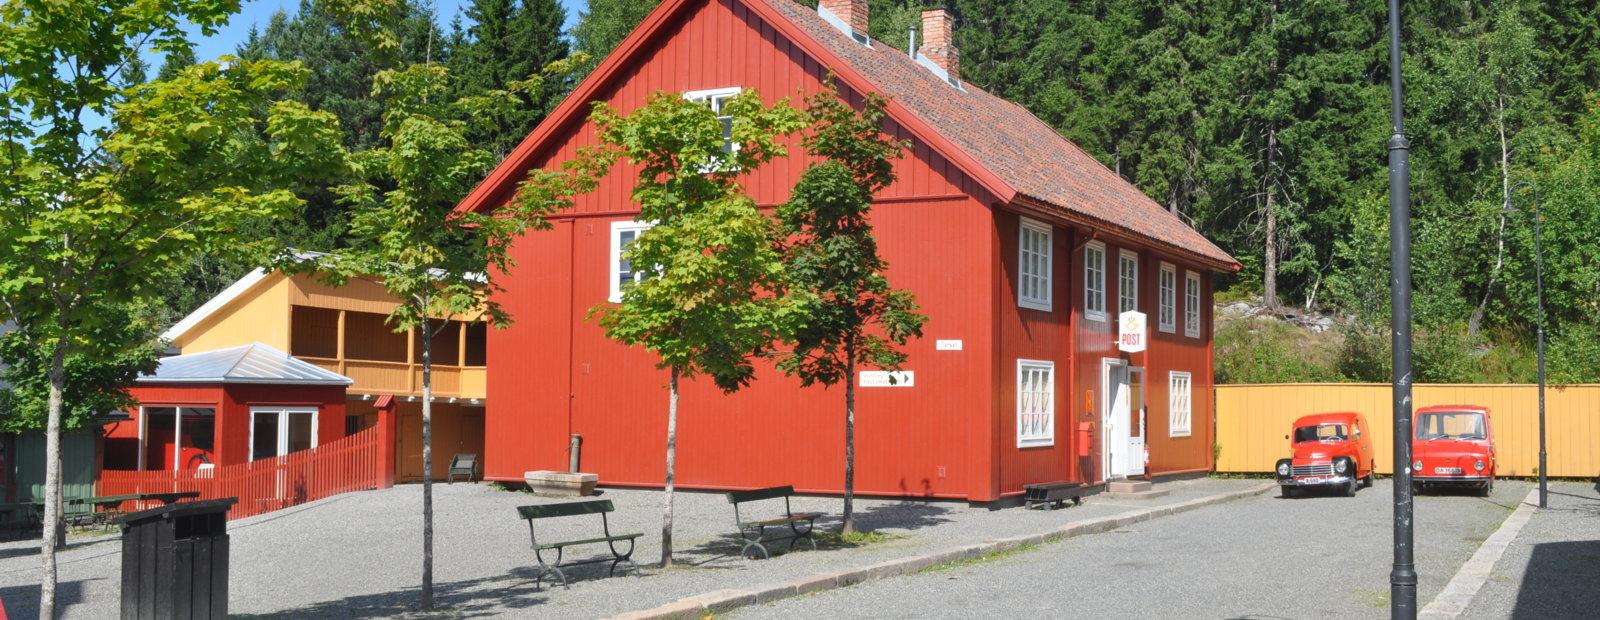 Norwegian Post Museum, Maihaugen, Lillehammer